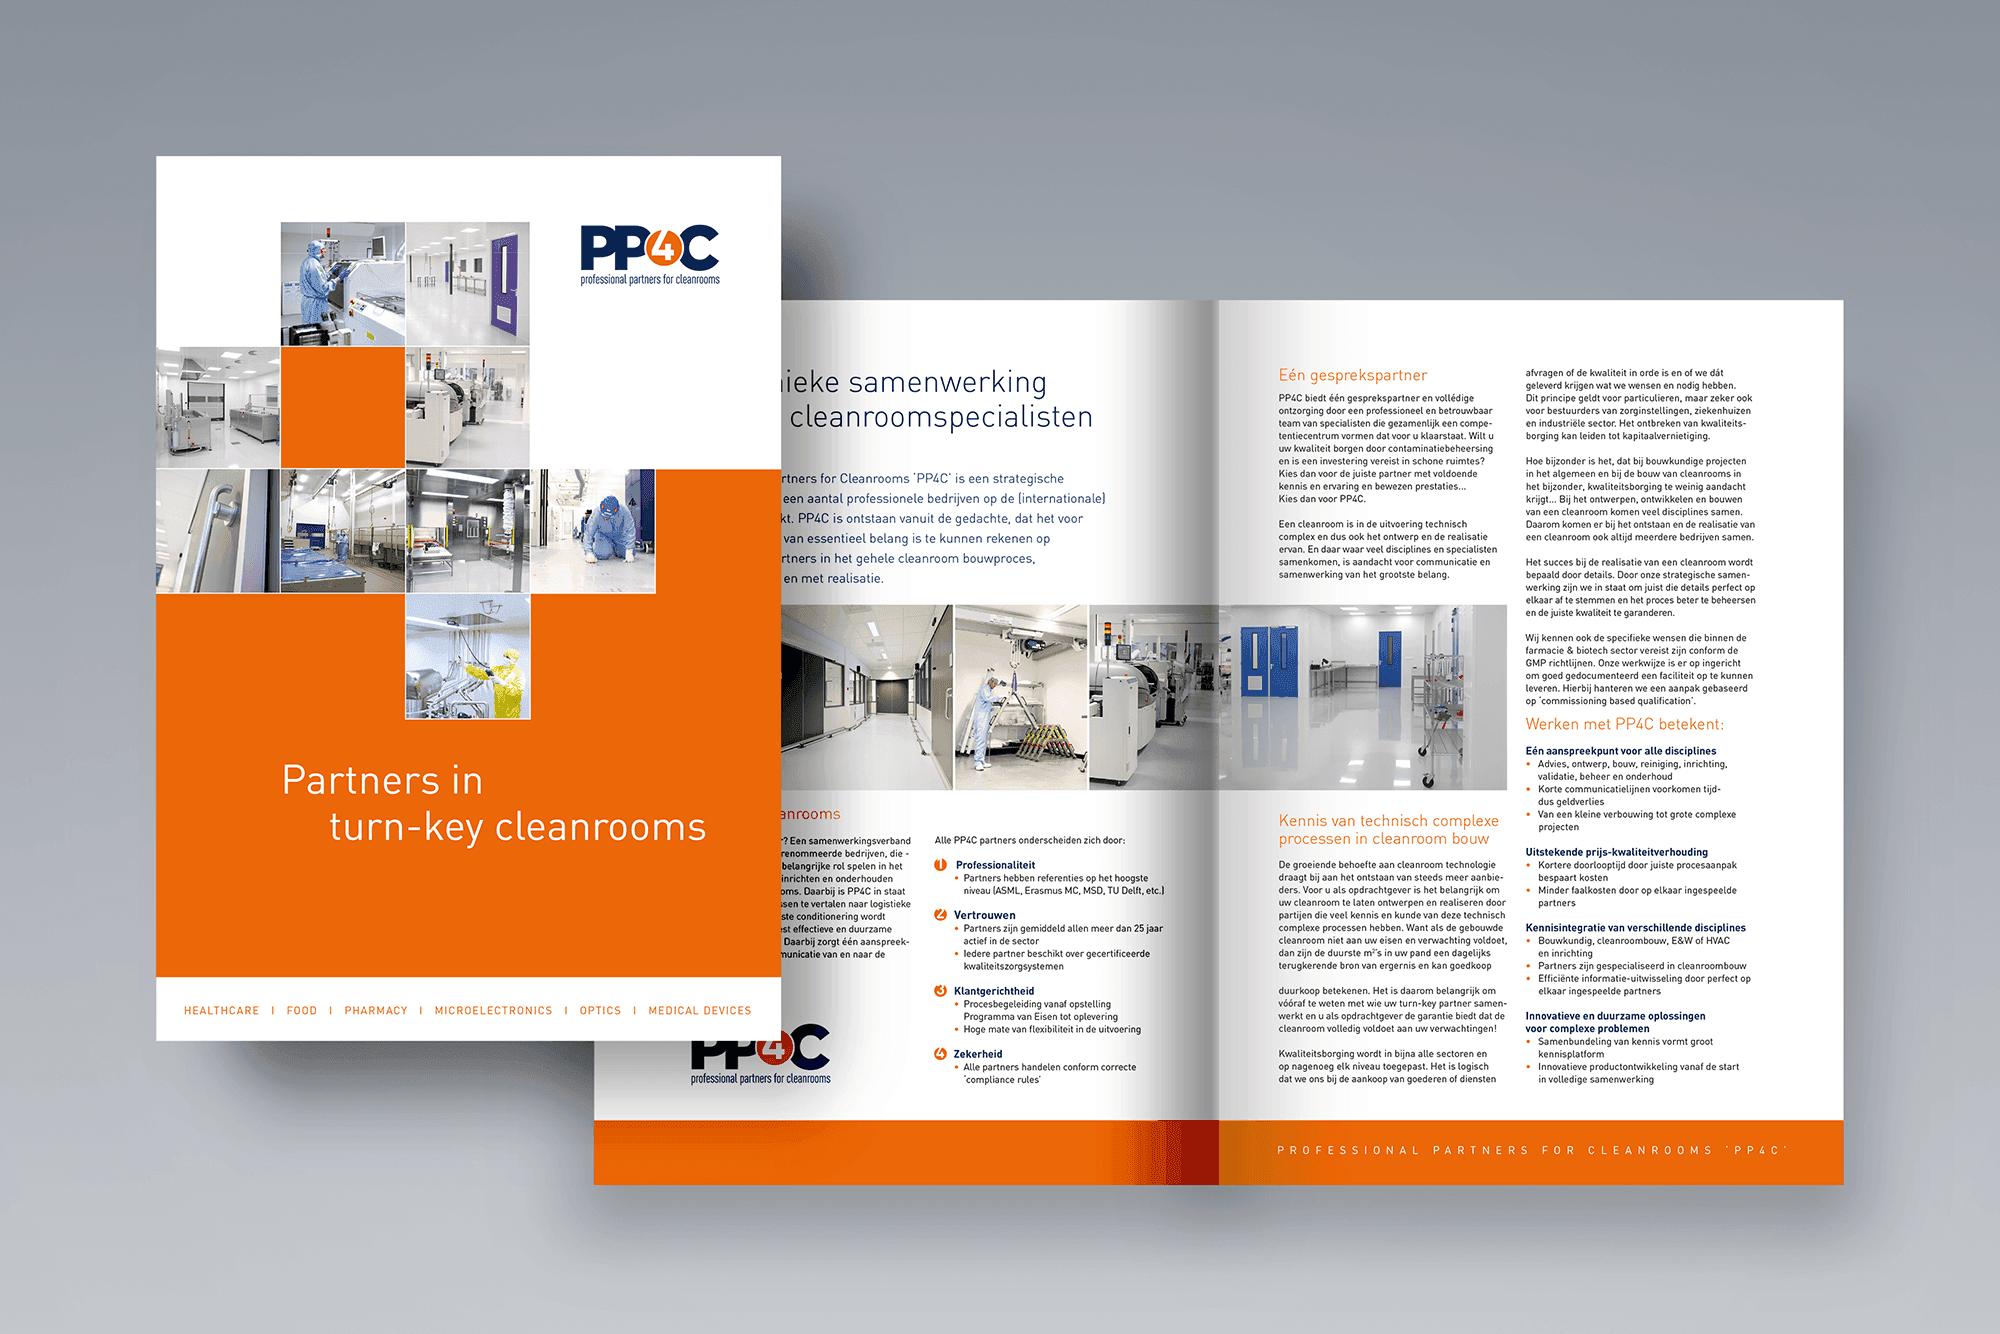 Brochure Brecon Group - PP4C